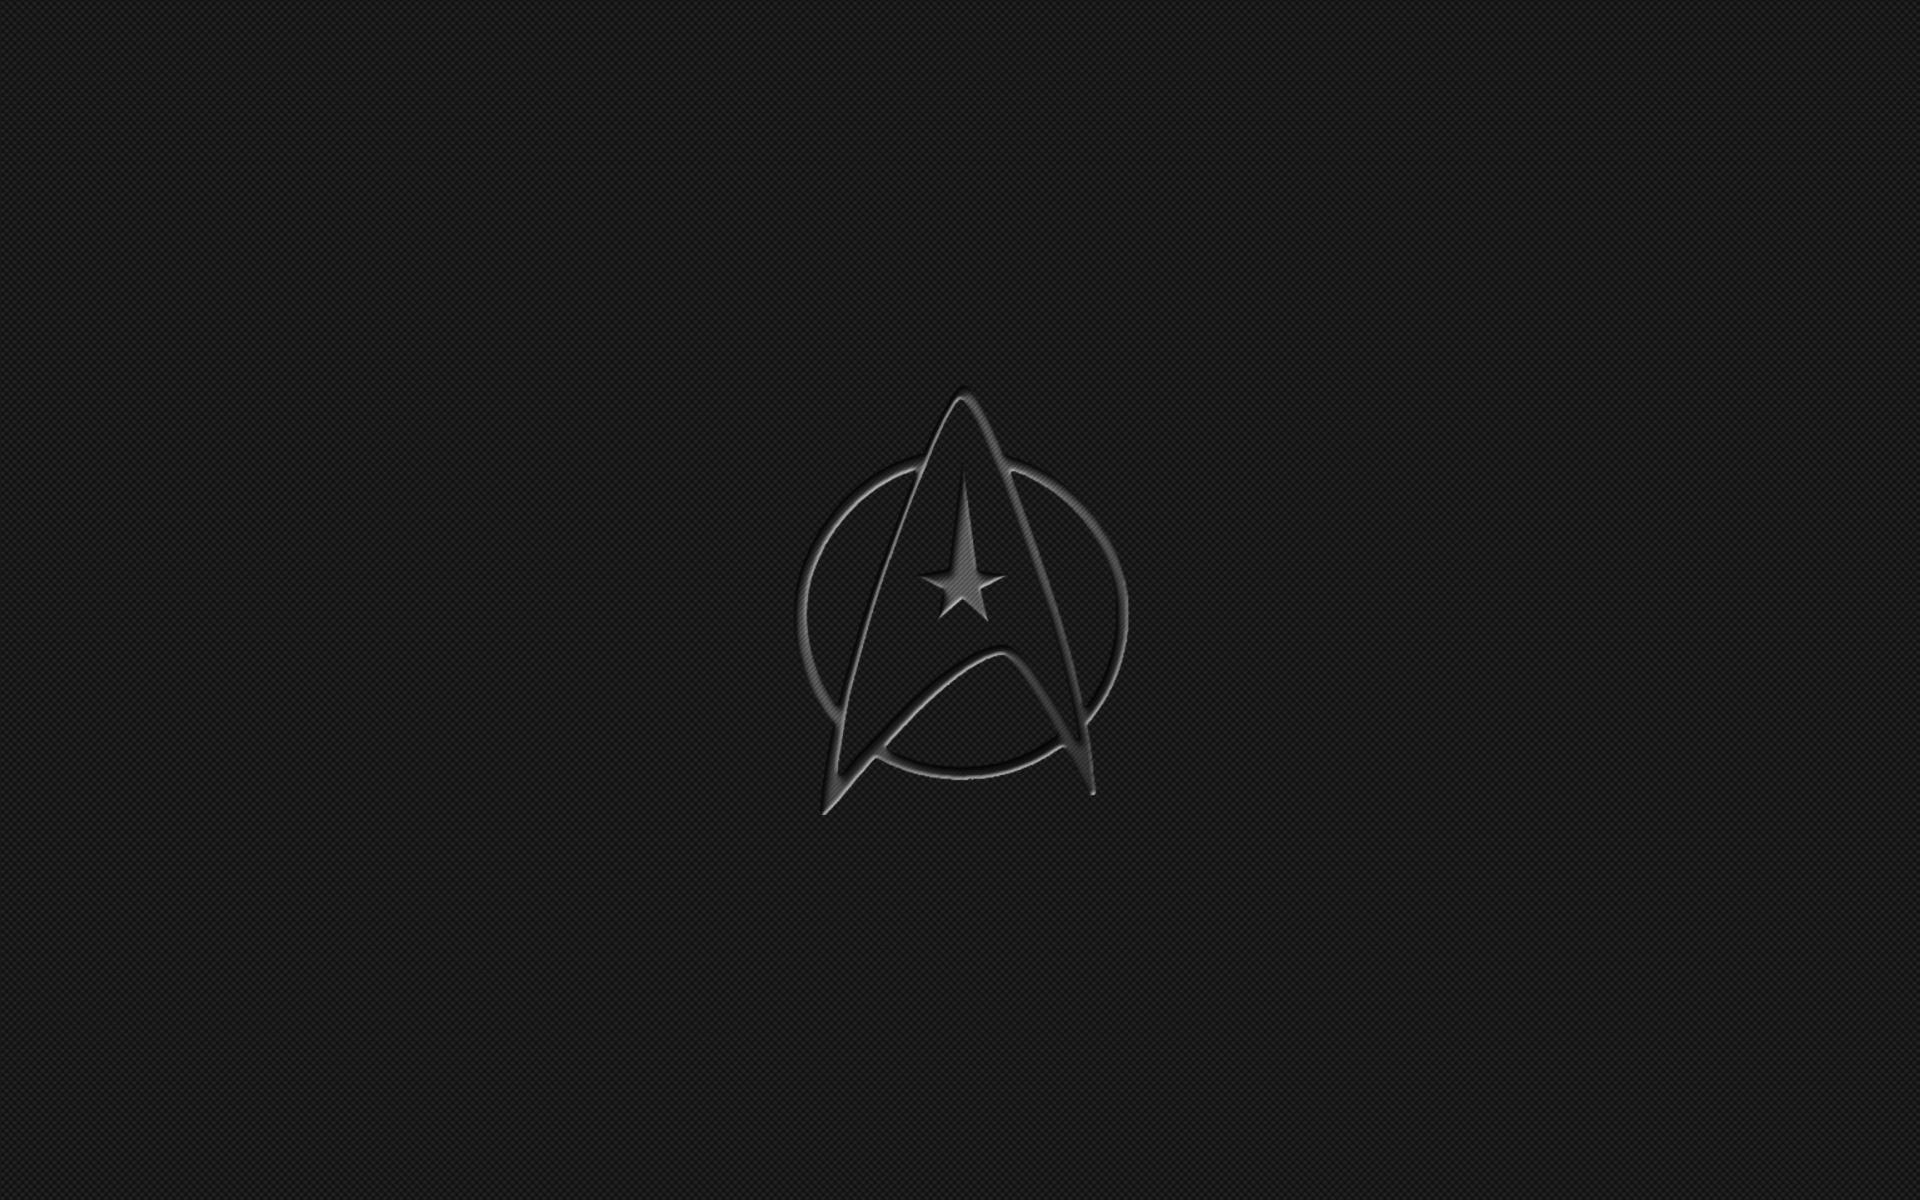 star-trek-logo-desktop-background - wallpaper.wiki